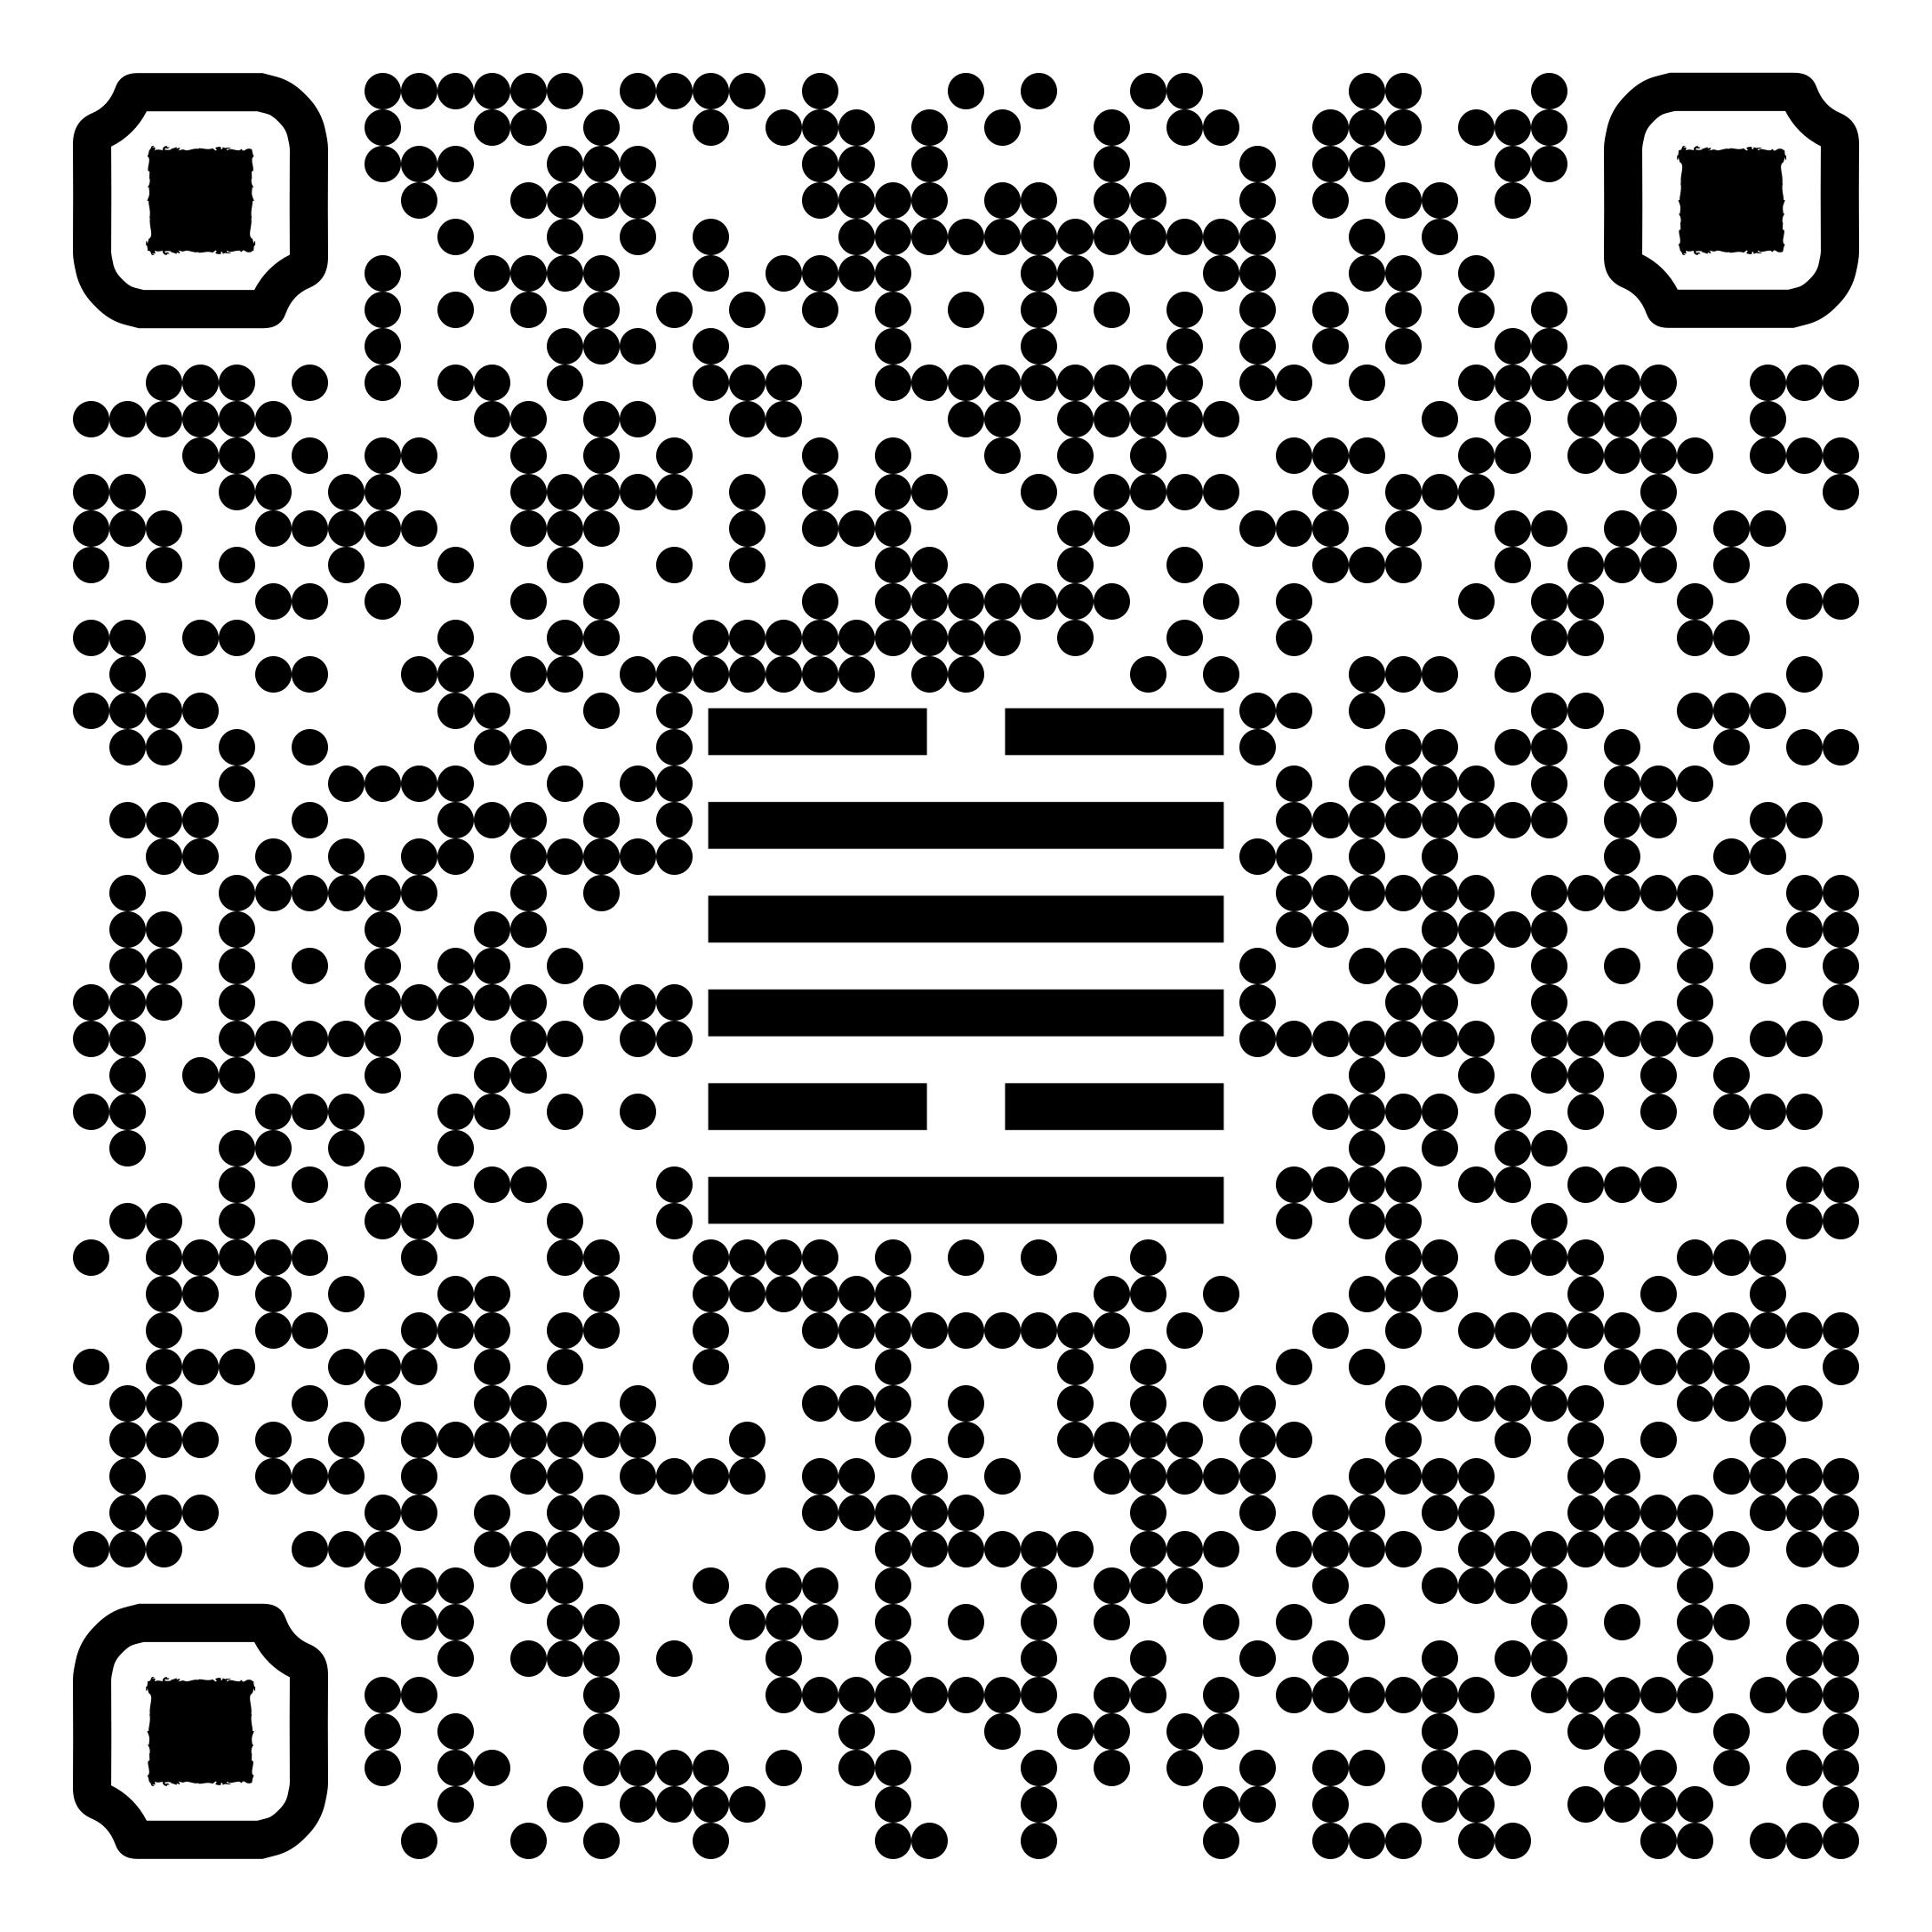 qr-code-49.png